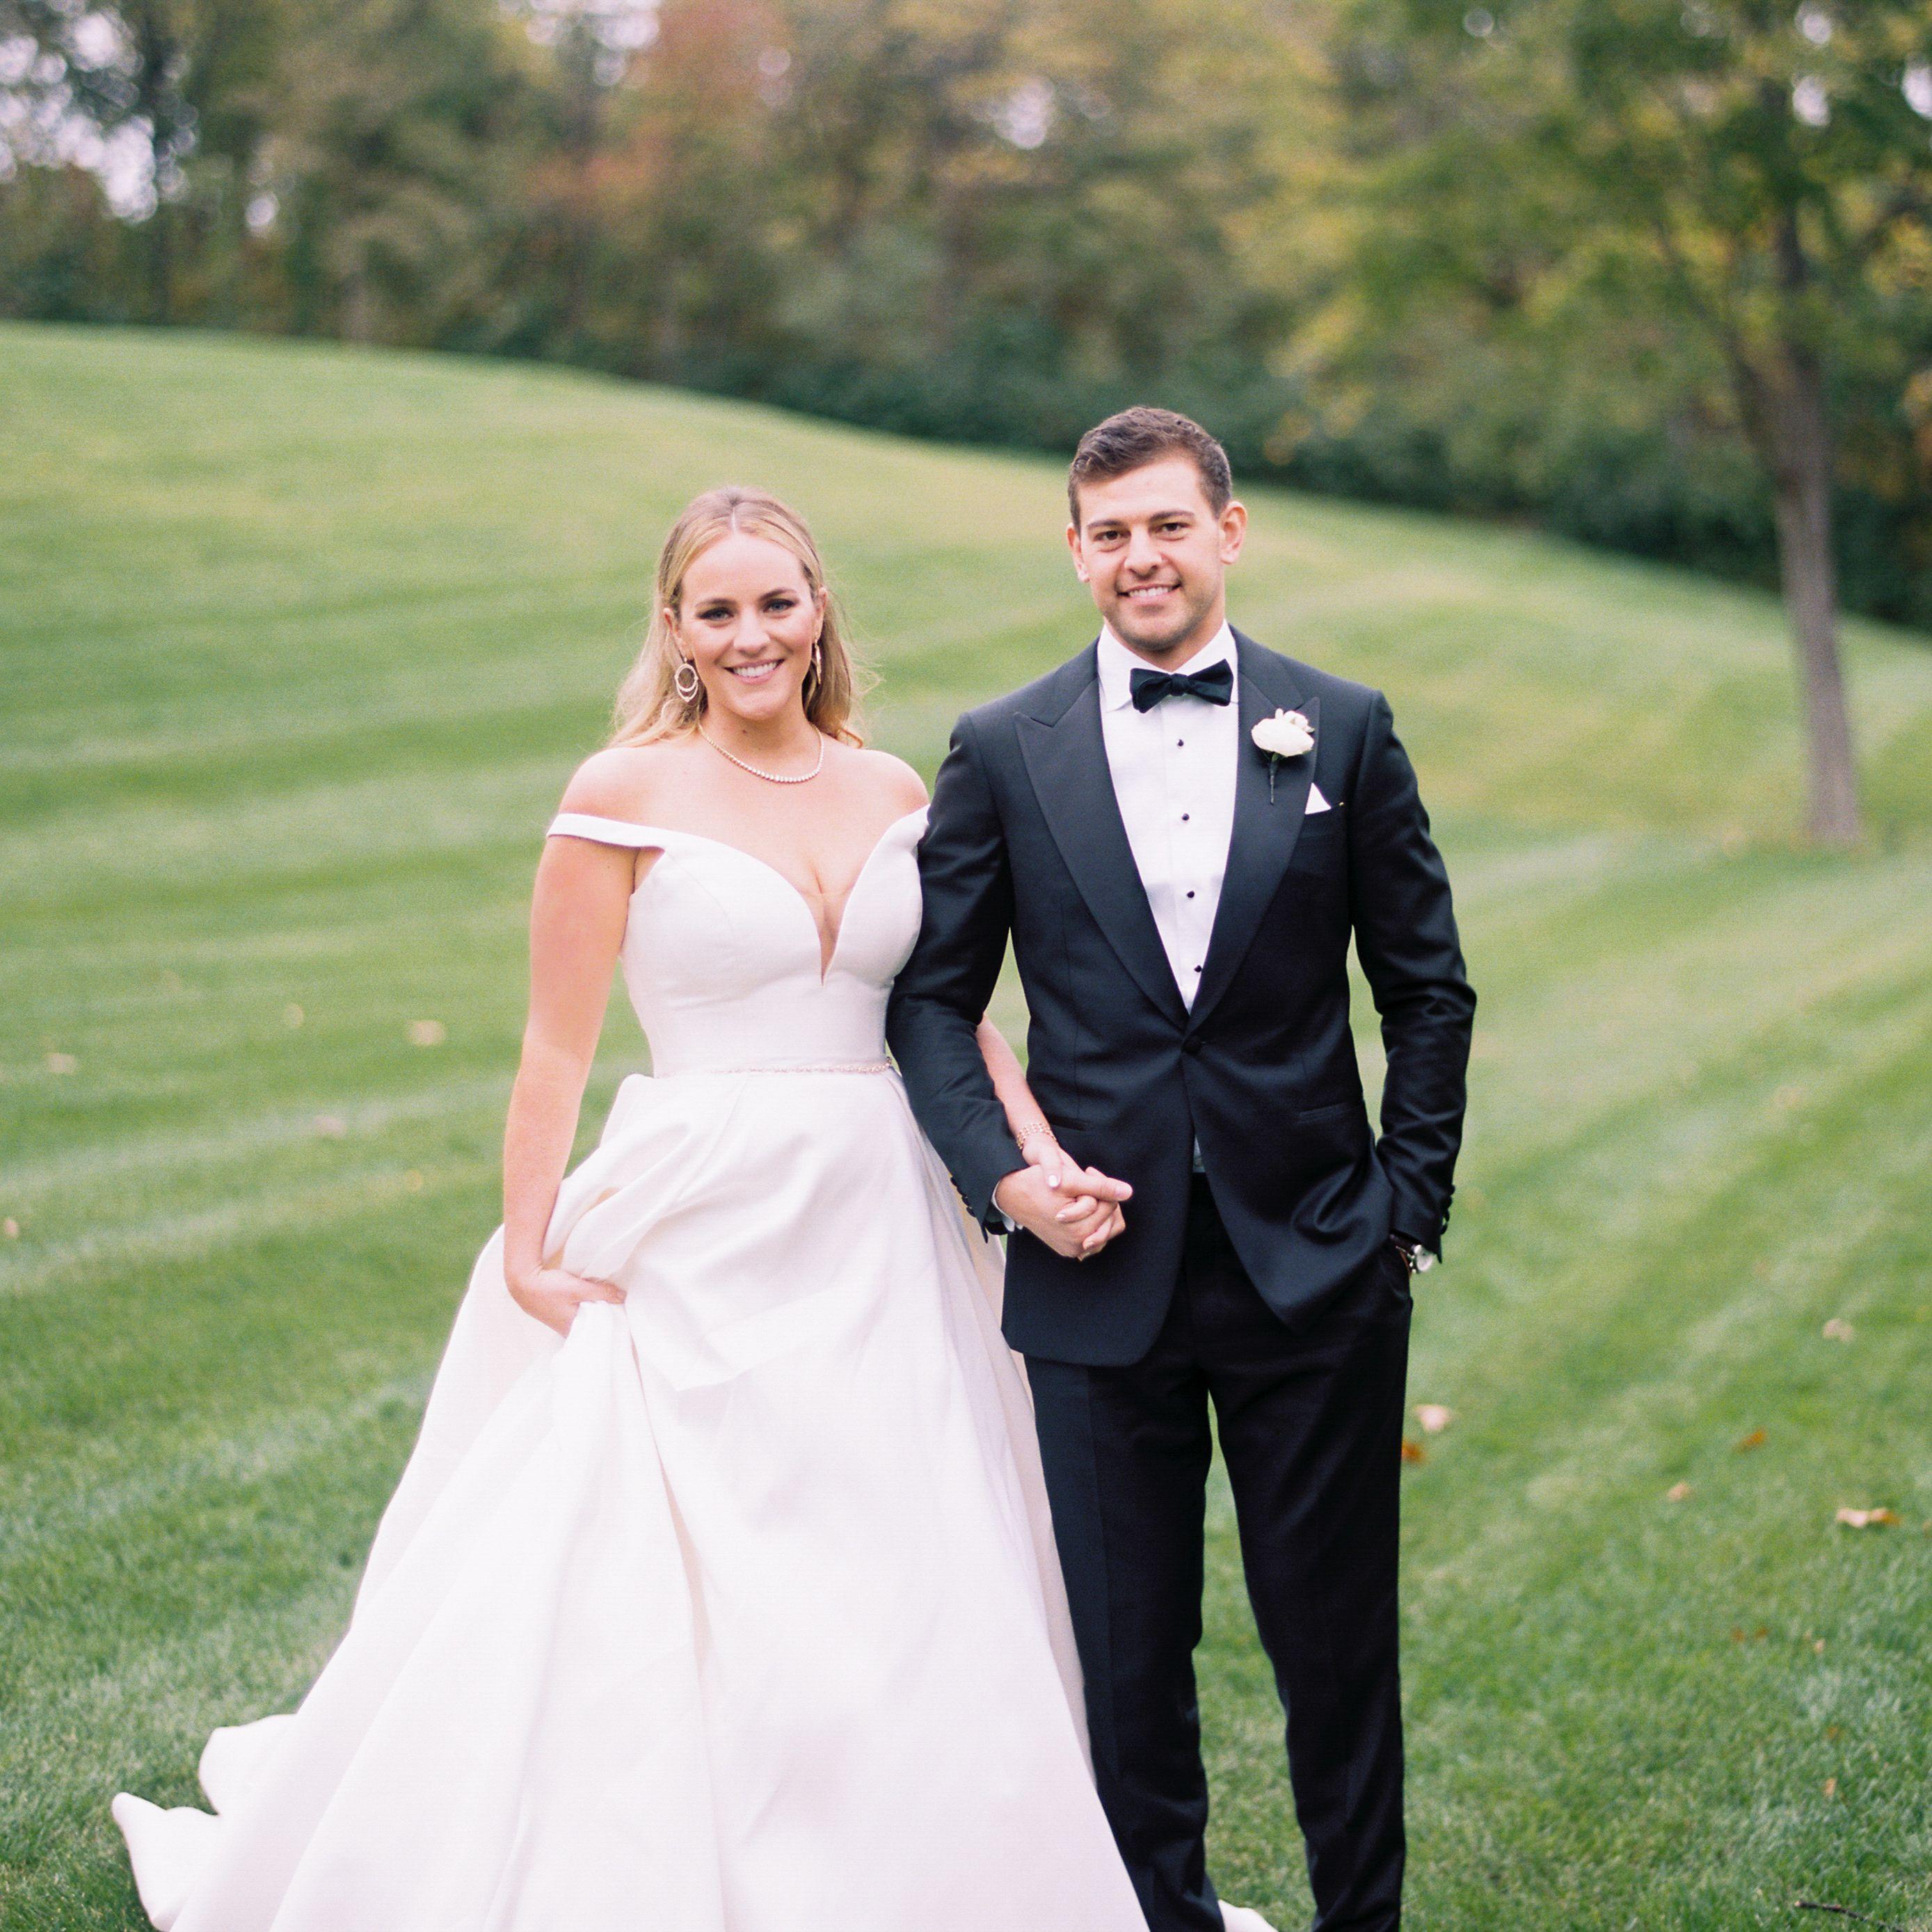 An Elegant Wedding At The Bride S Family Farm